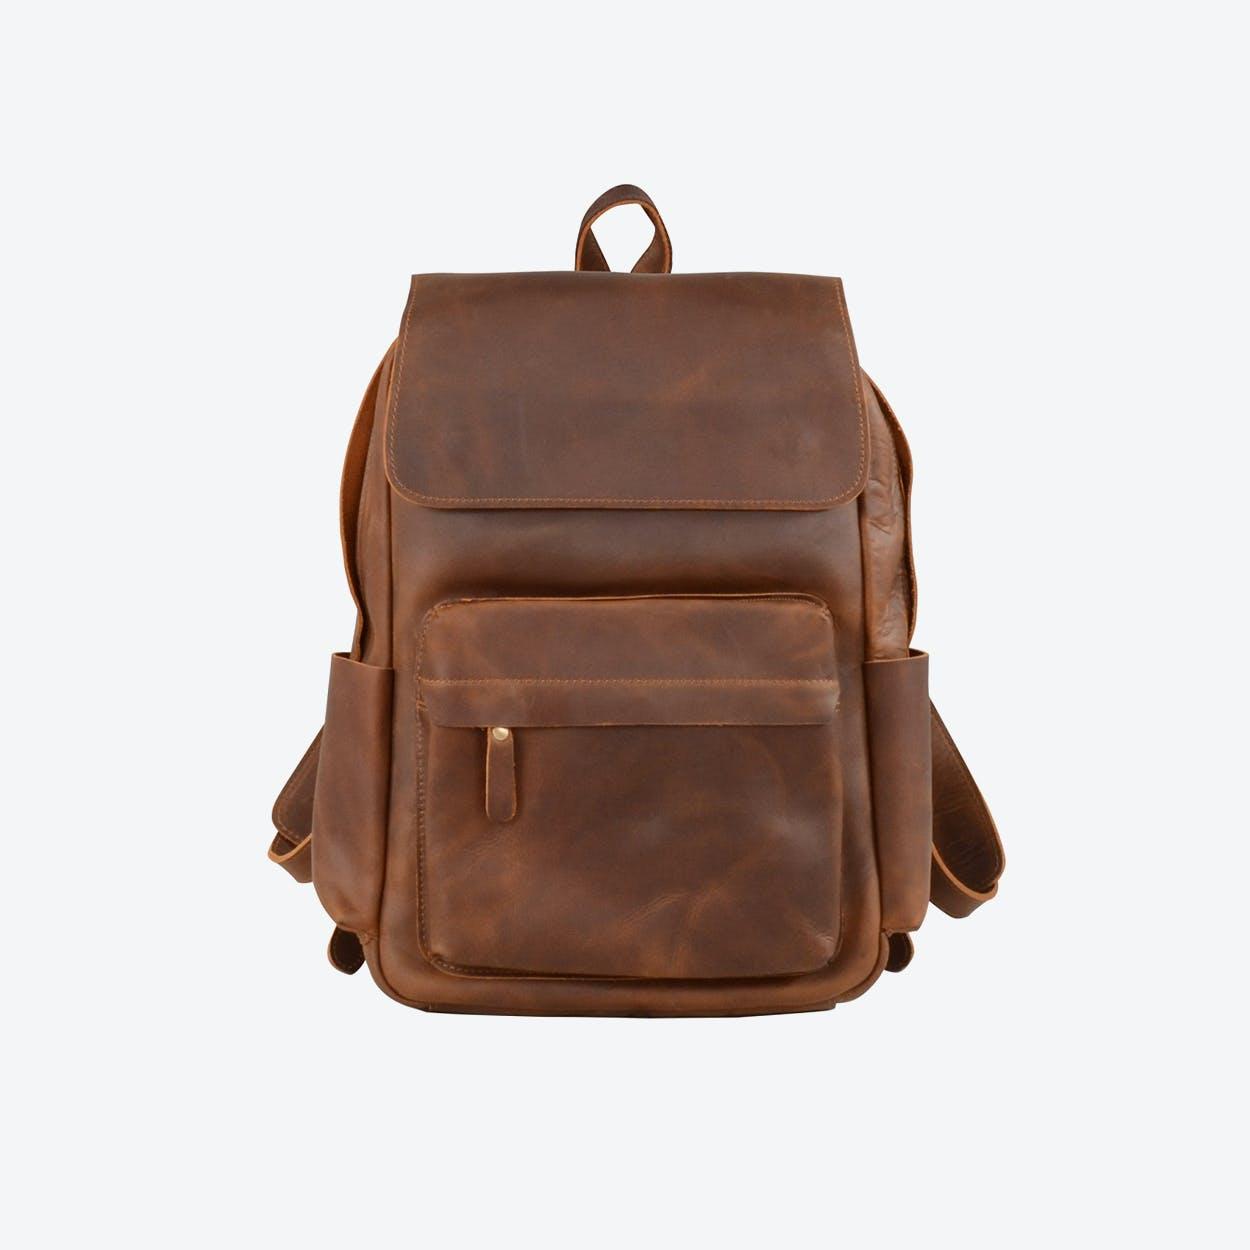 Vintage Leather Backpack in Brown